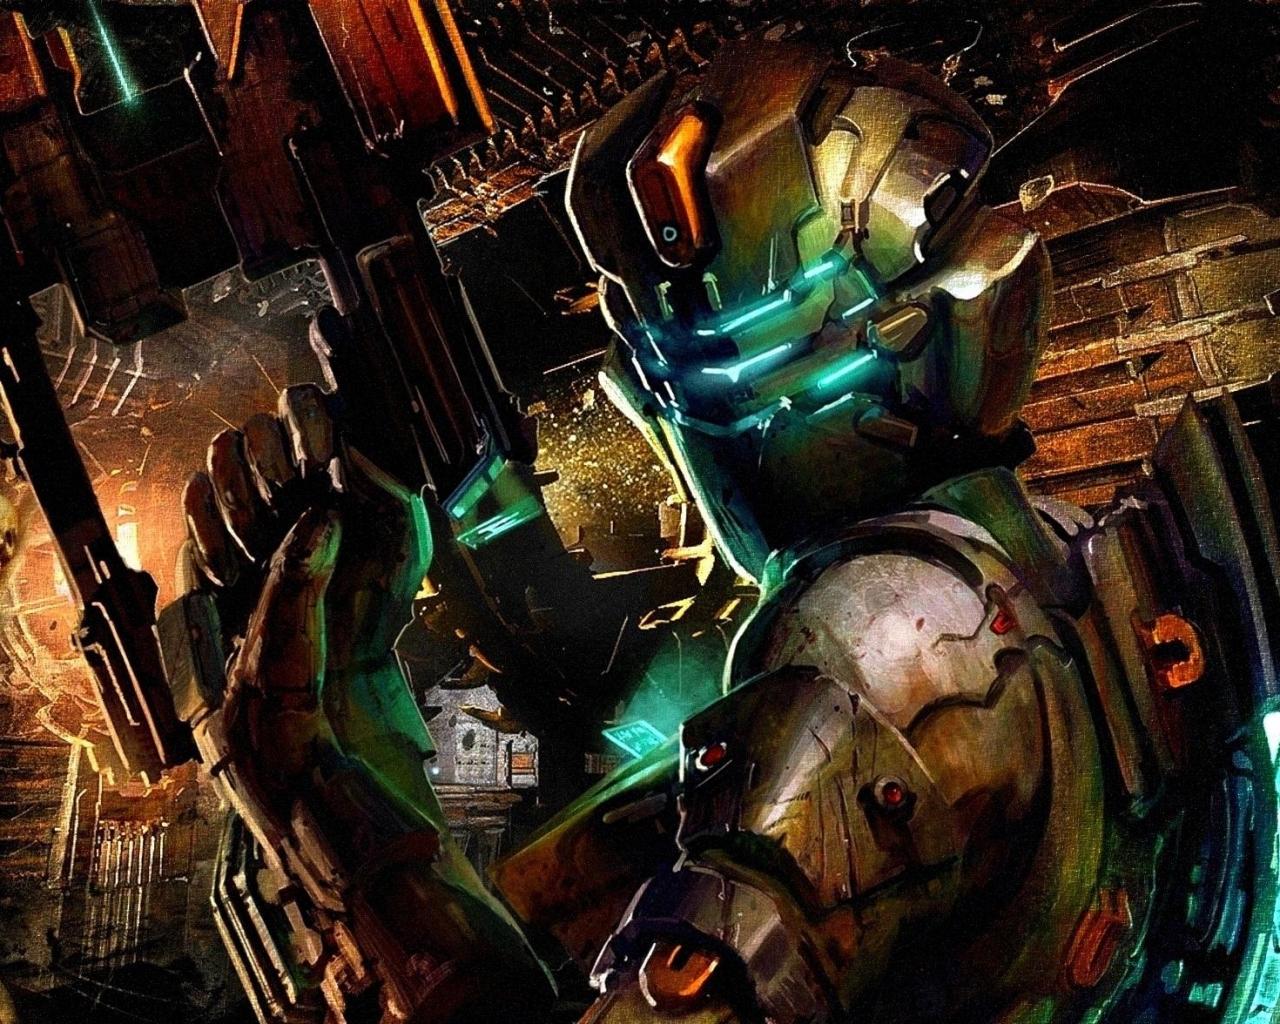 Dead Space 2 Game Art wallpaper 1280x1024   Fondo hd 2666 1280x1024